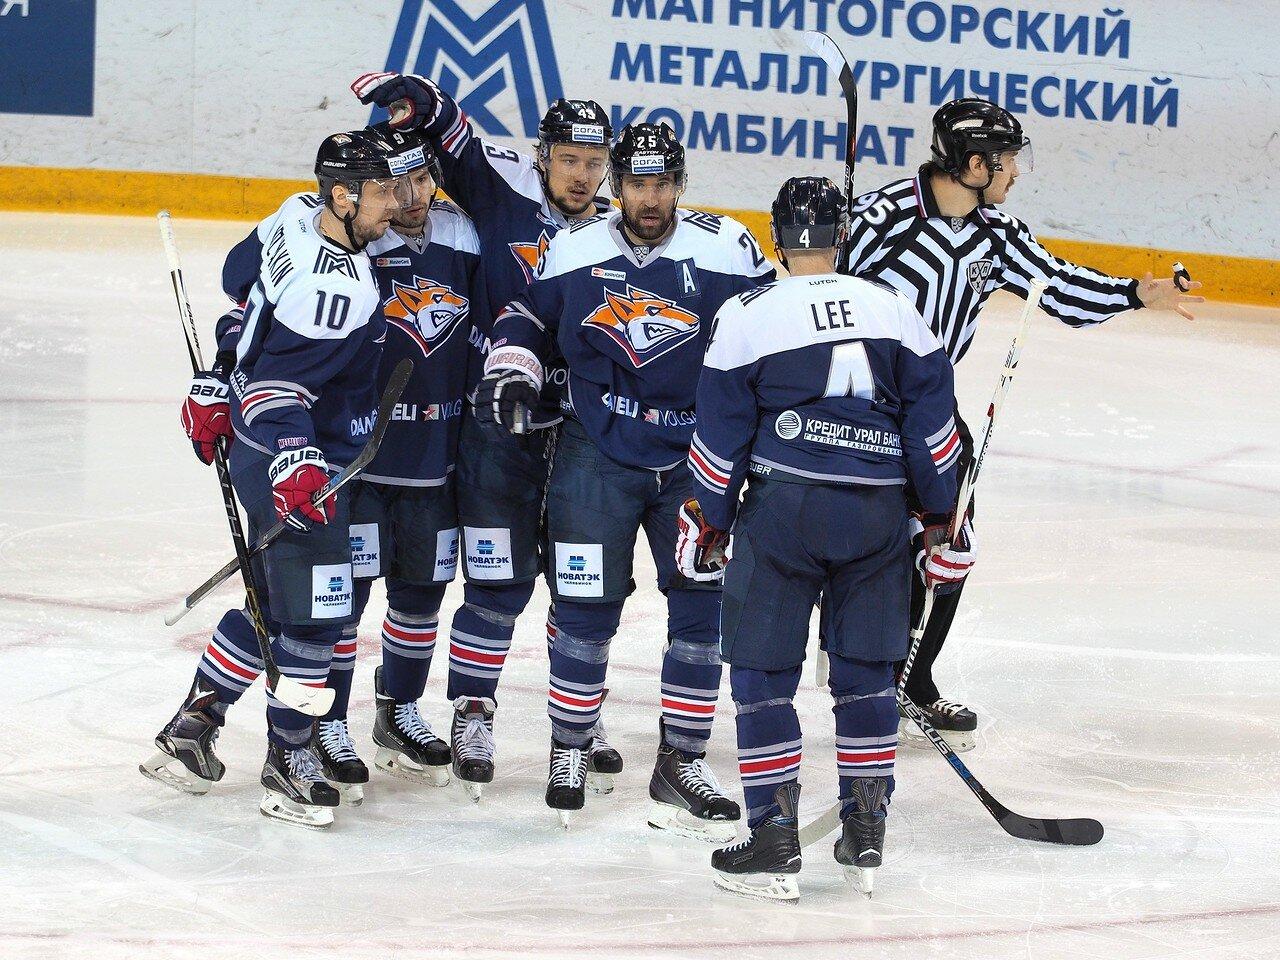 109Плей-офф 2016 Восток 1/2 Металлург - Сибирь 10.03.2016